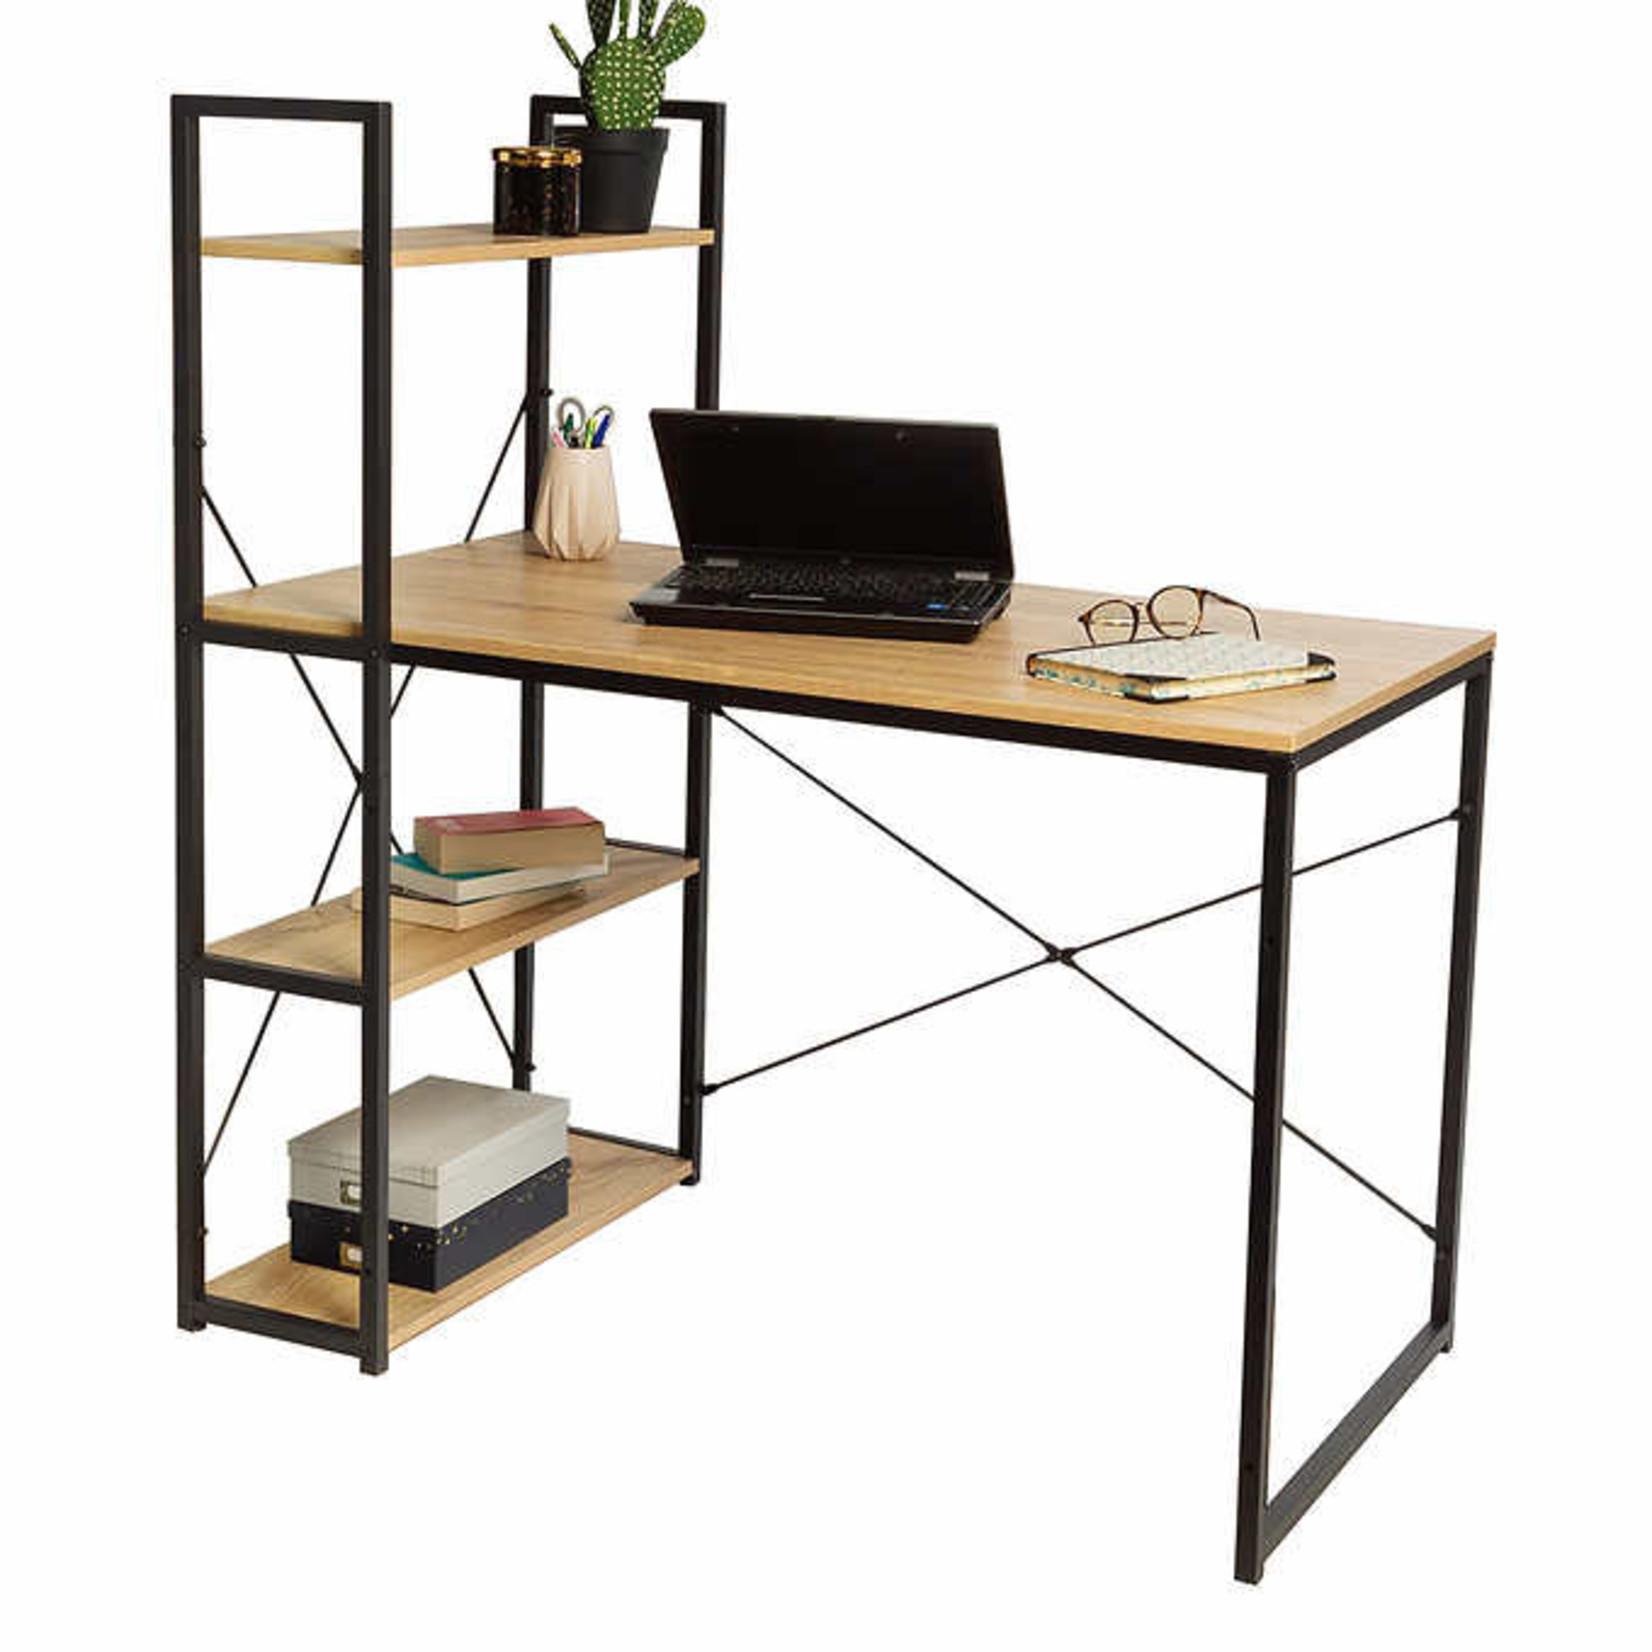 Modern Computer Desk with 4-tier Bookshelf